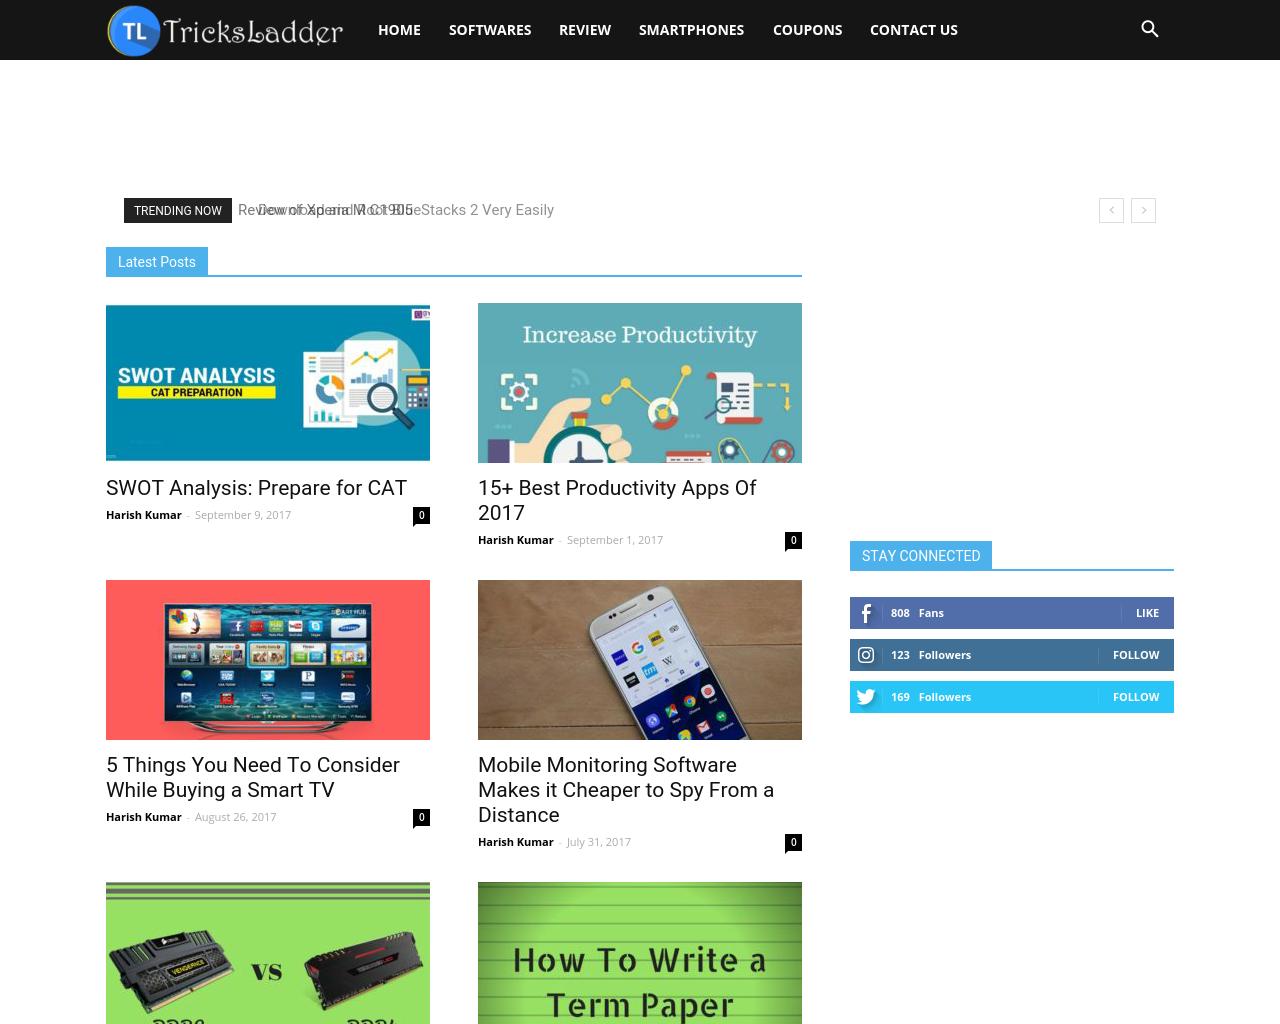 Tricksladder-Advertising-Reviews-Pricing